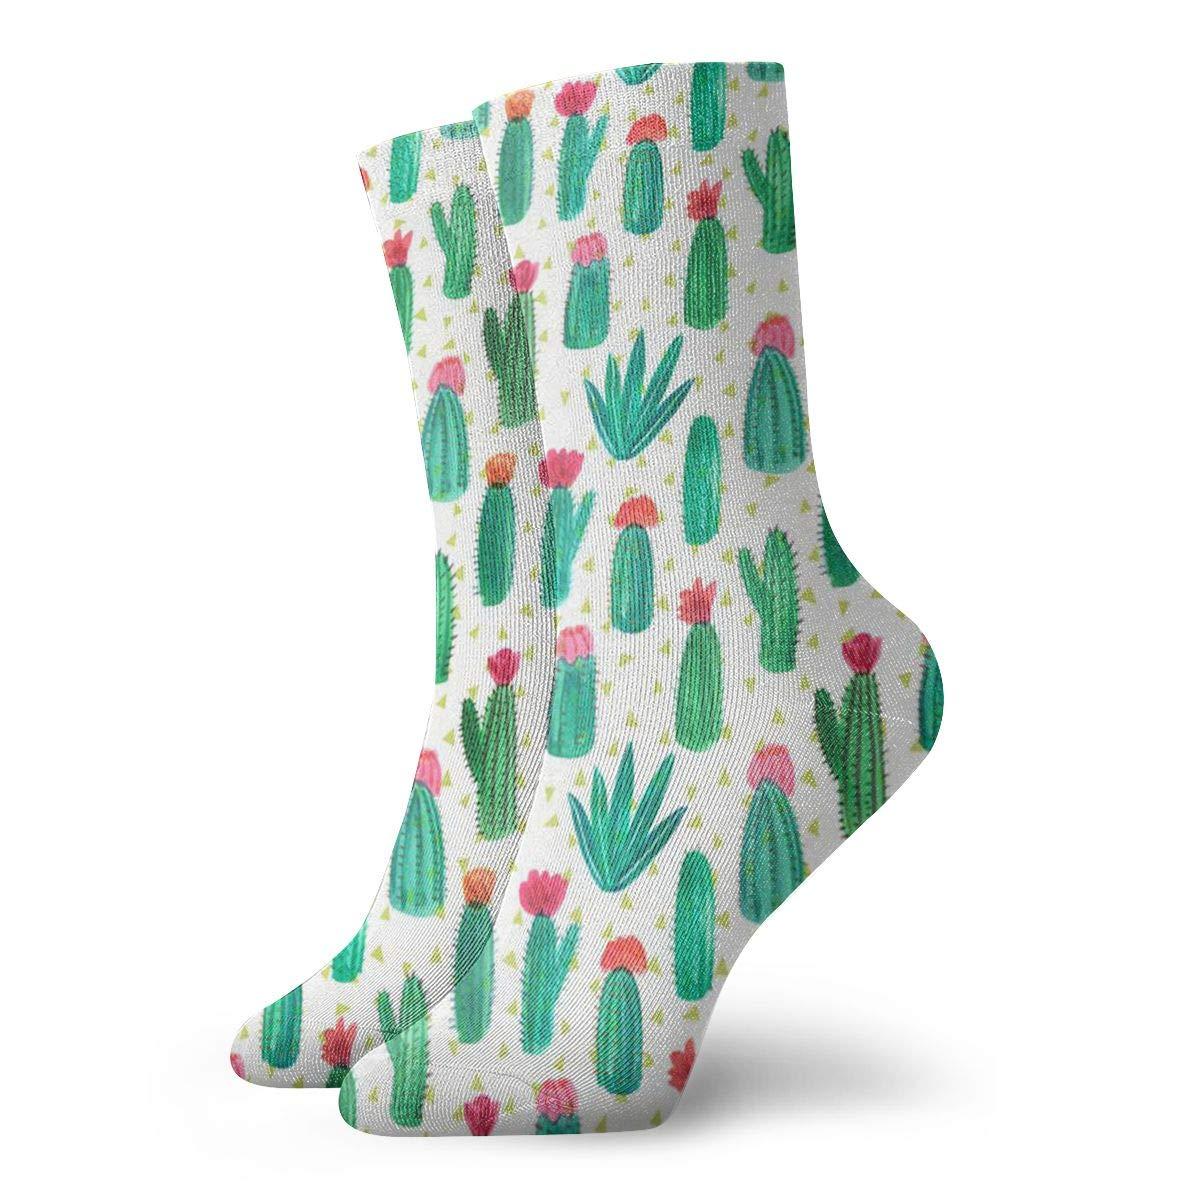 Cactus Pattern Unisex Funny Casual Crew Socks Athletic Socks For Boys Girls Kids Teenagers